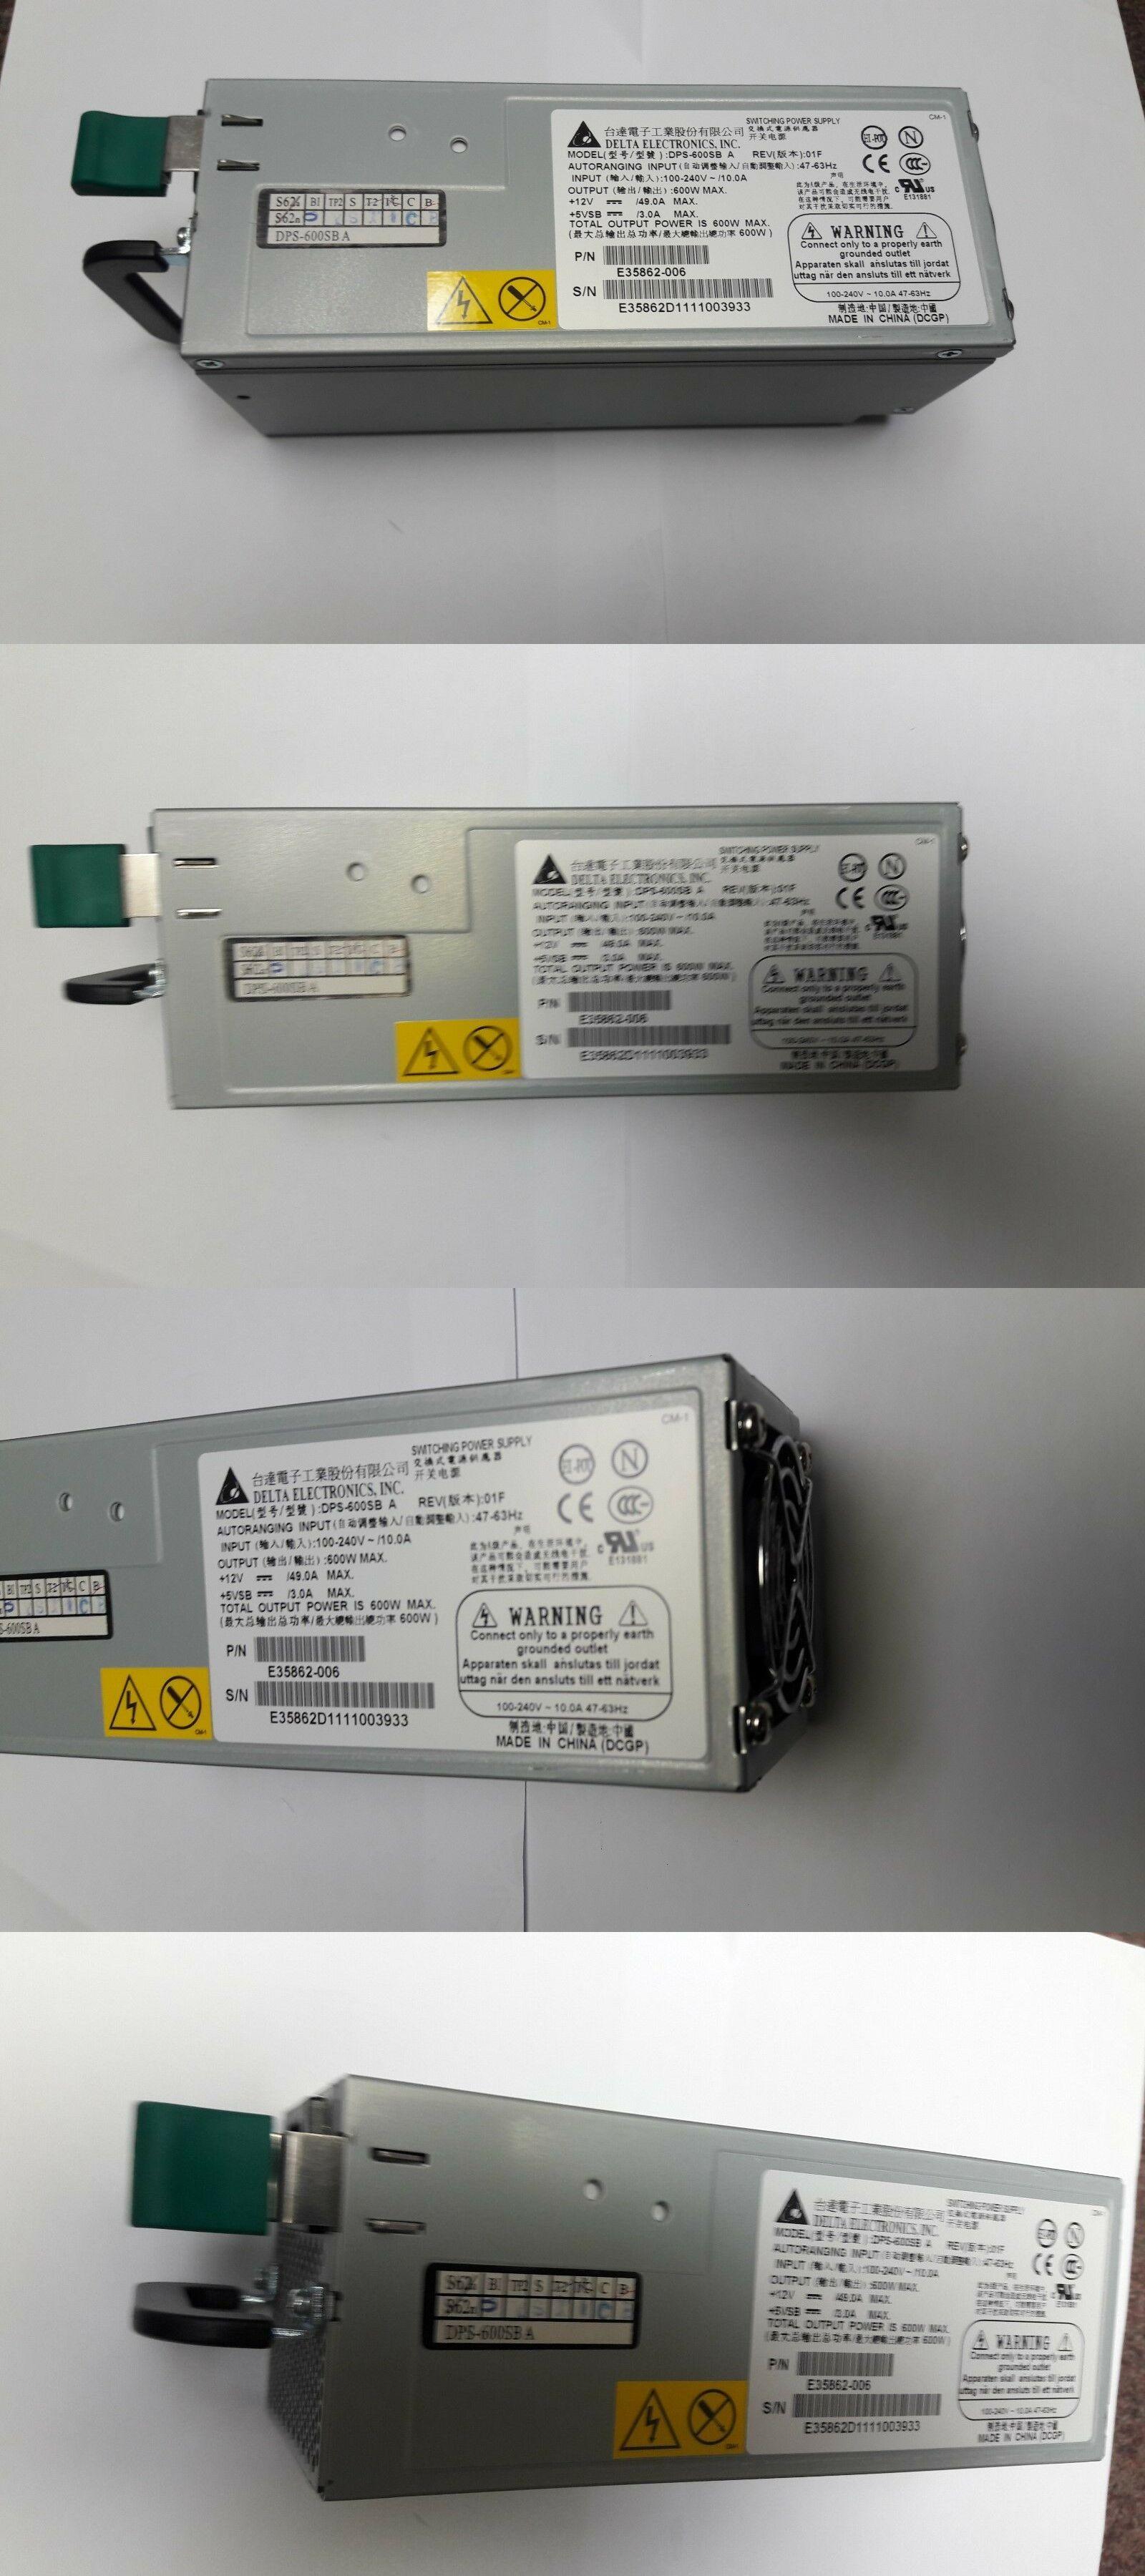 Intel Appt600whpsu Dps 600sb A 600w Power Supply Module E35962 006 Power Supply Intel Ebay